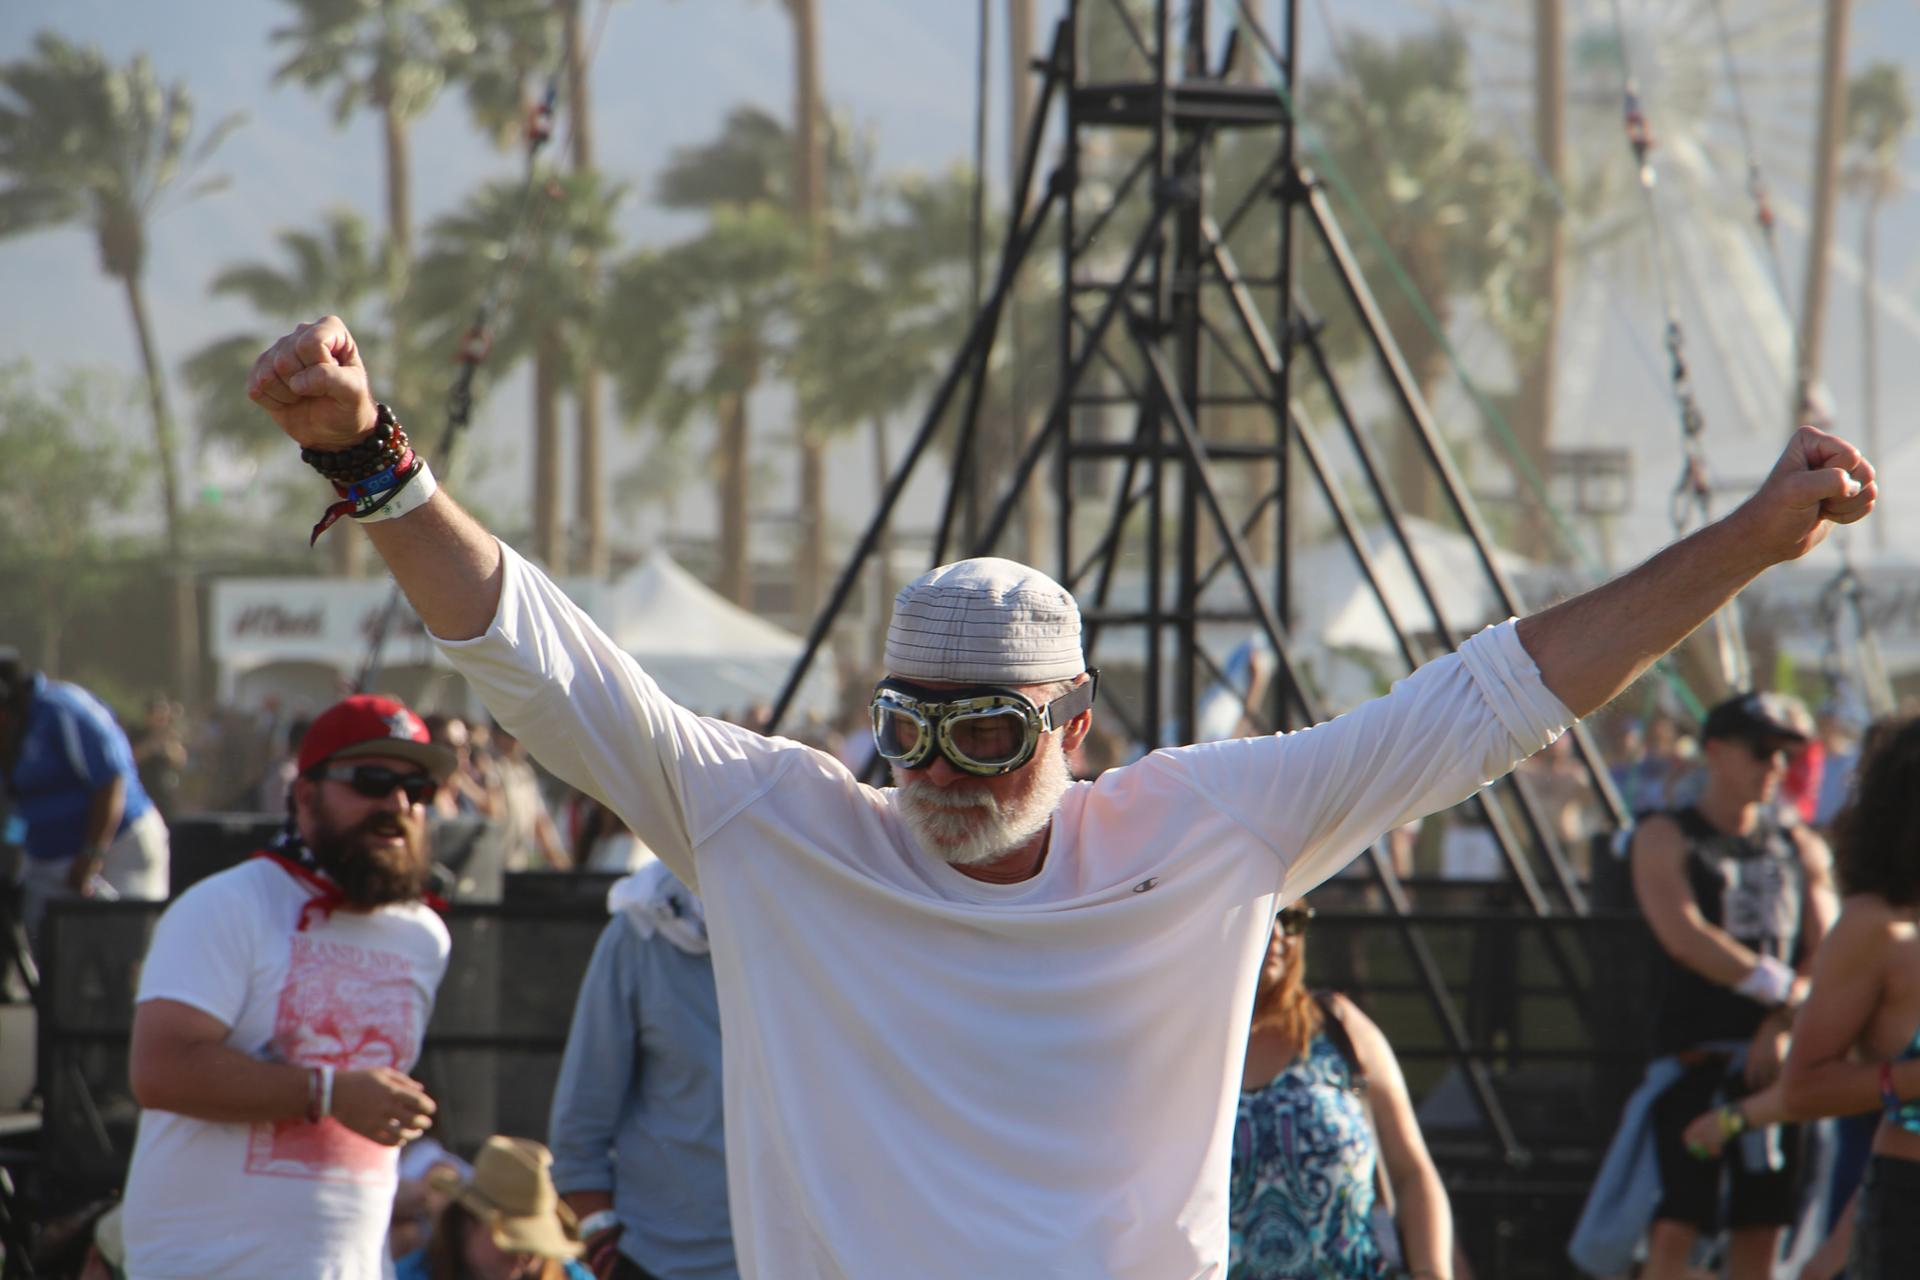 Old man, Coachella 16